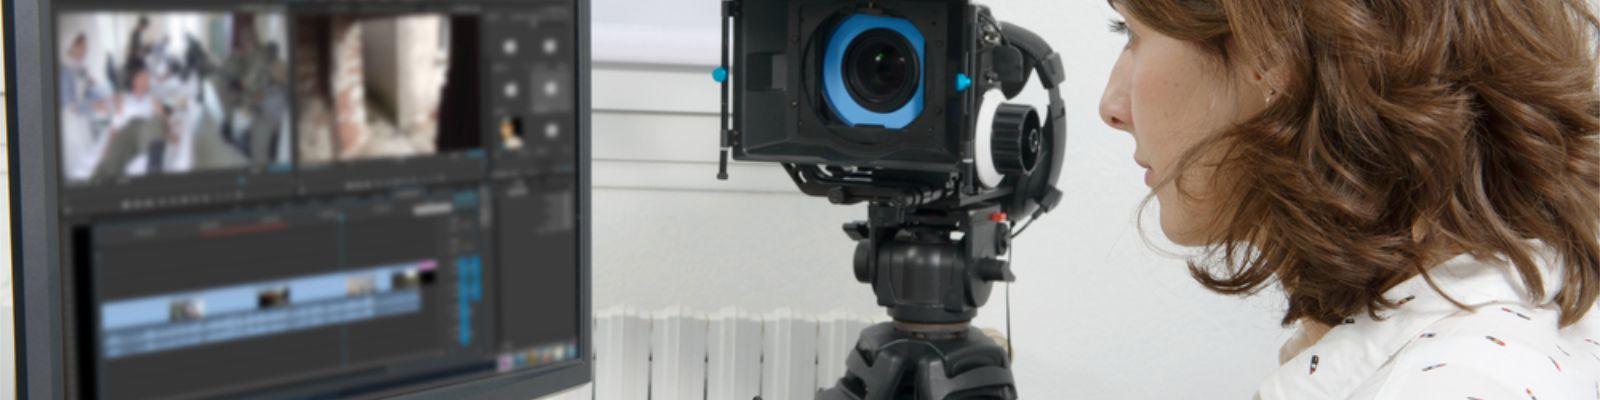 Parallex_Premium Video Package £1499 + Vat